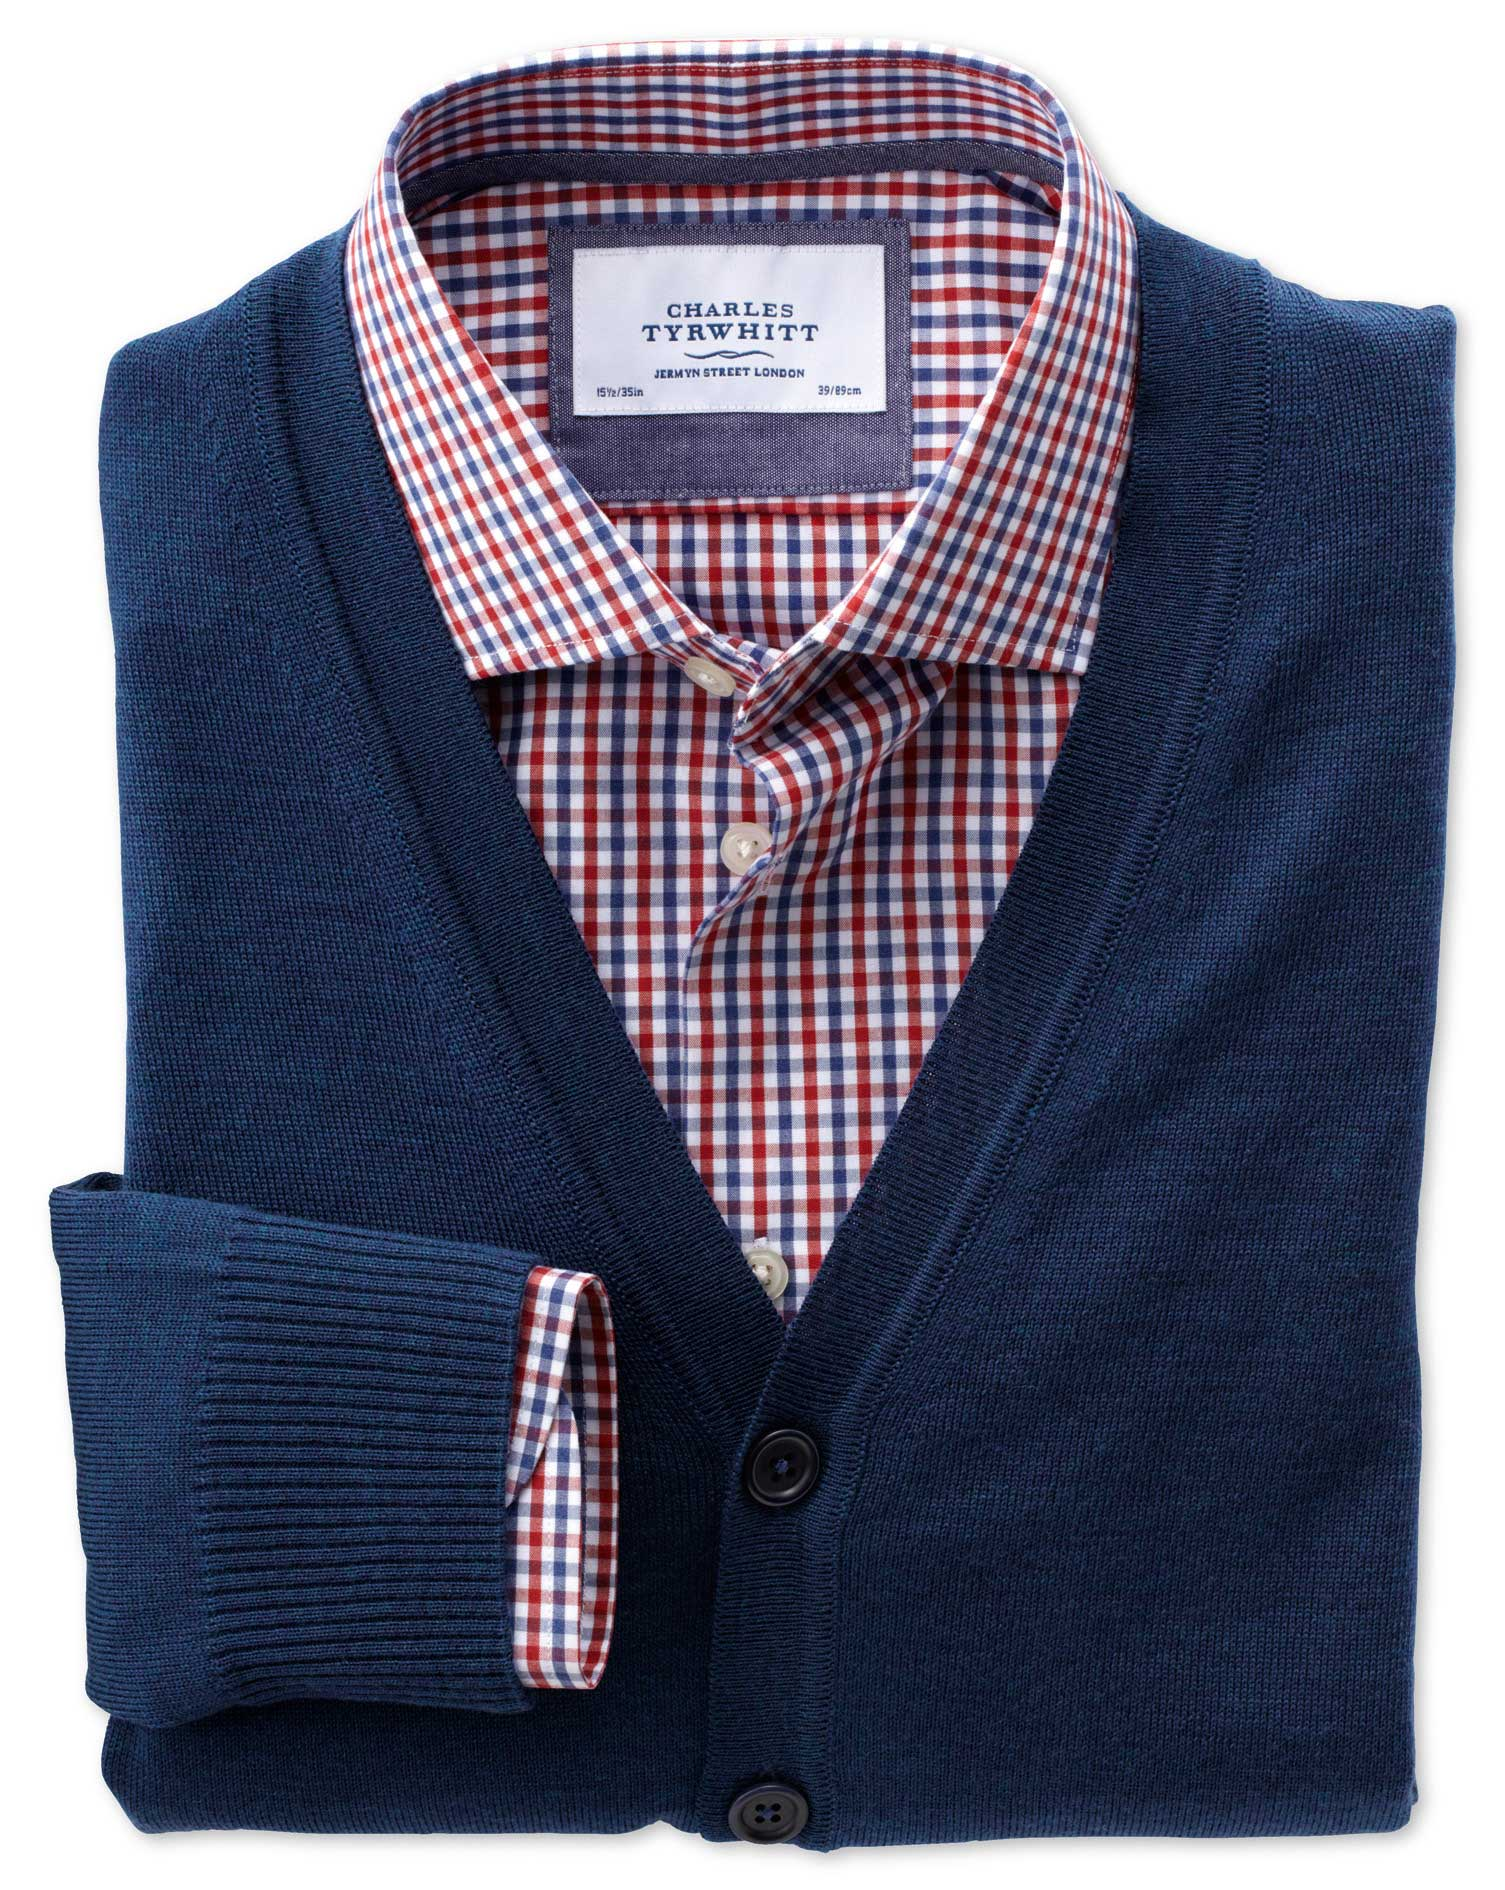 Mid Blue Merino Wool Cardigan Size XXL by Charles Tyrwhitt